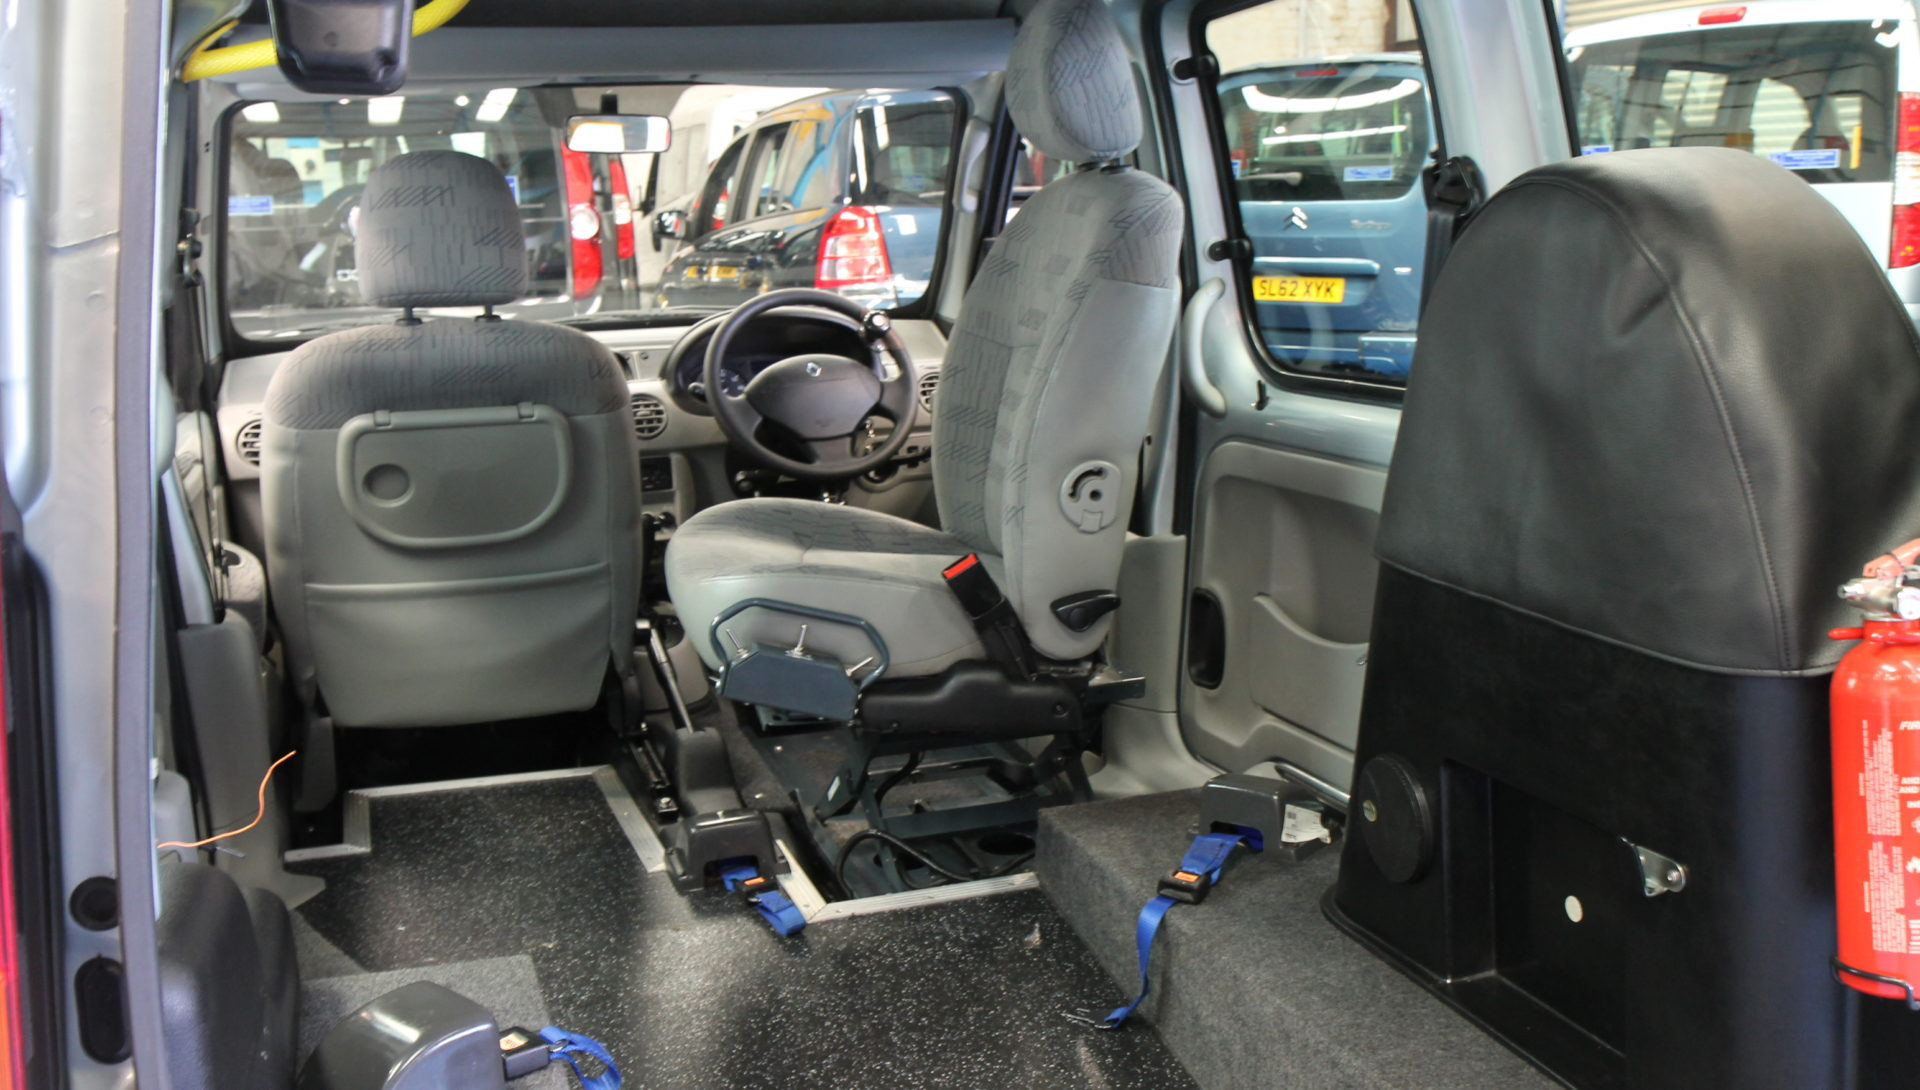 Kangoo Transfer from wheelchair to drive